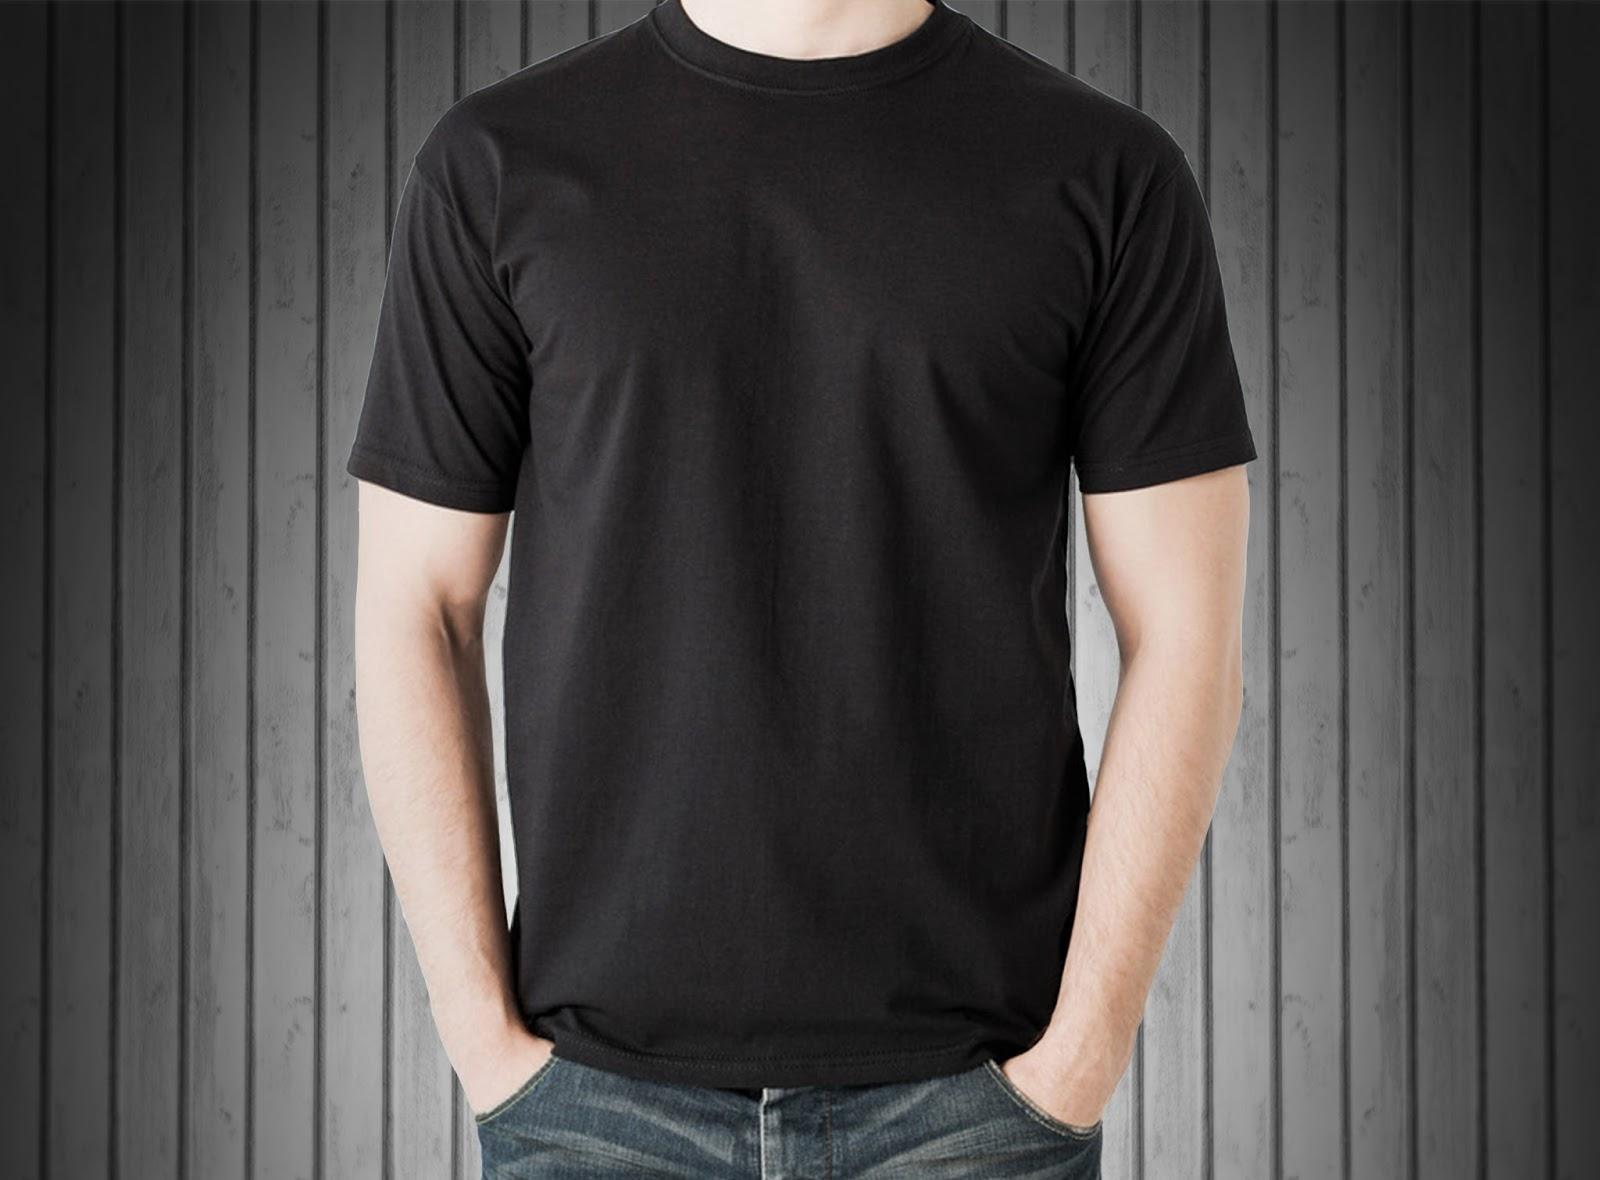 Download Mockup T Shirt Template